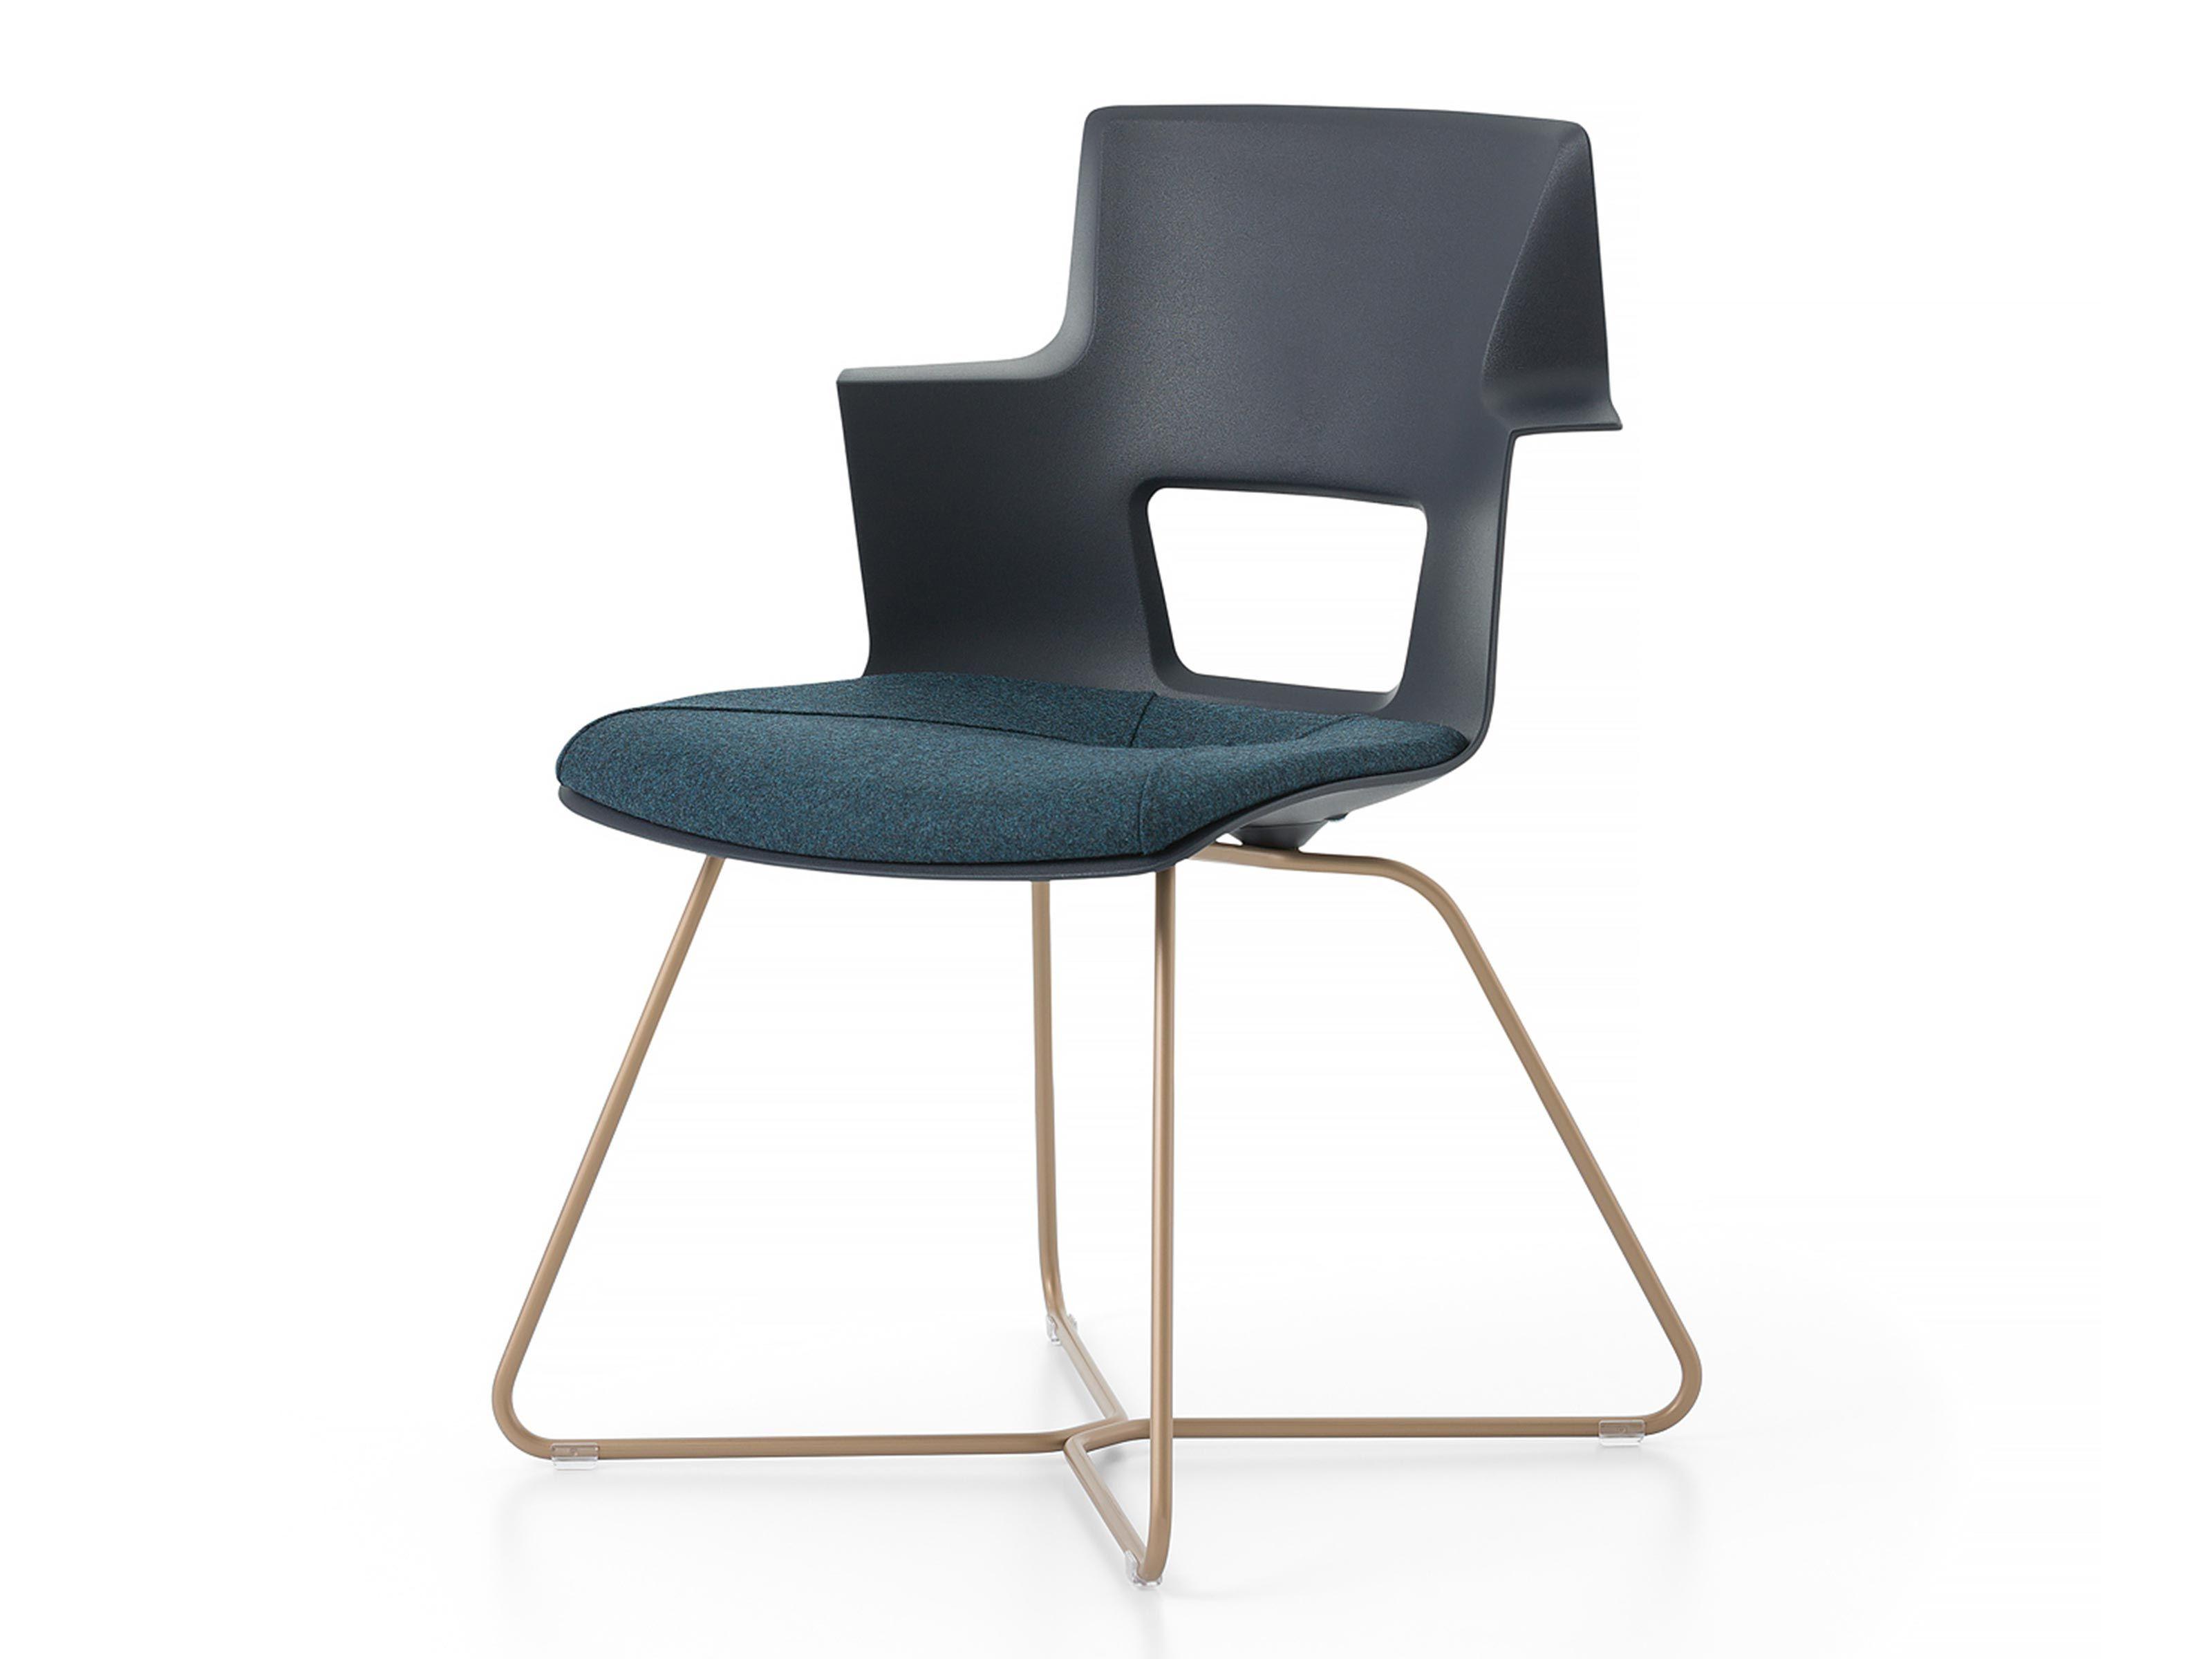 Shortcut X Base   Happy office   Pinterest   Base, Chair ...